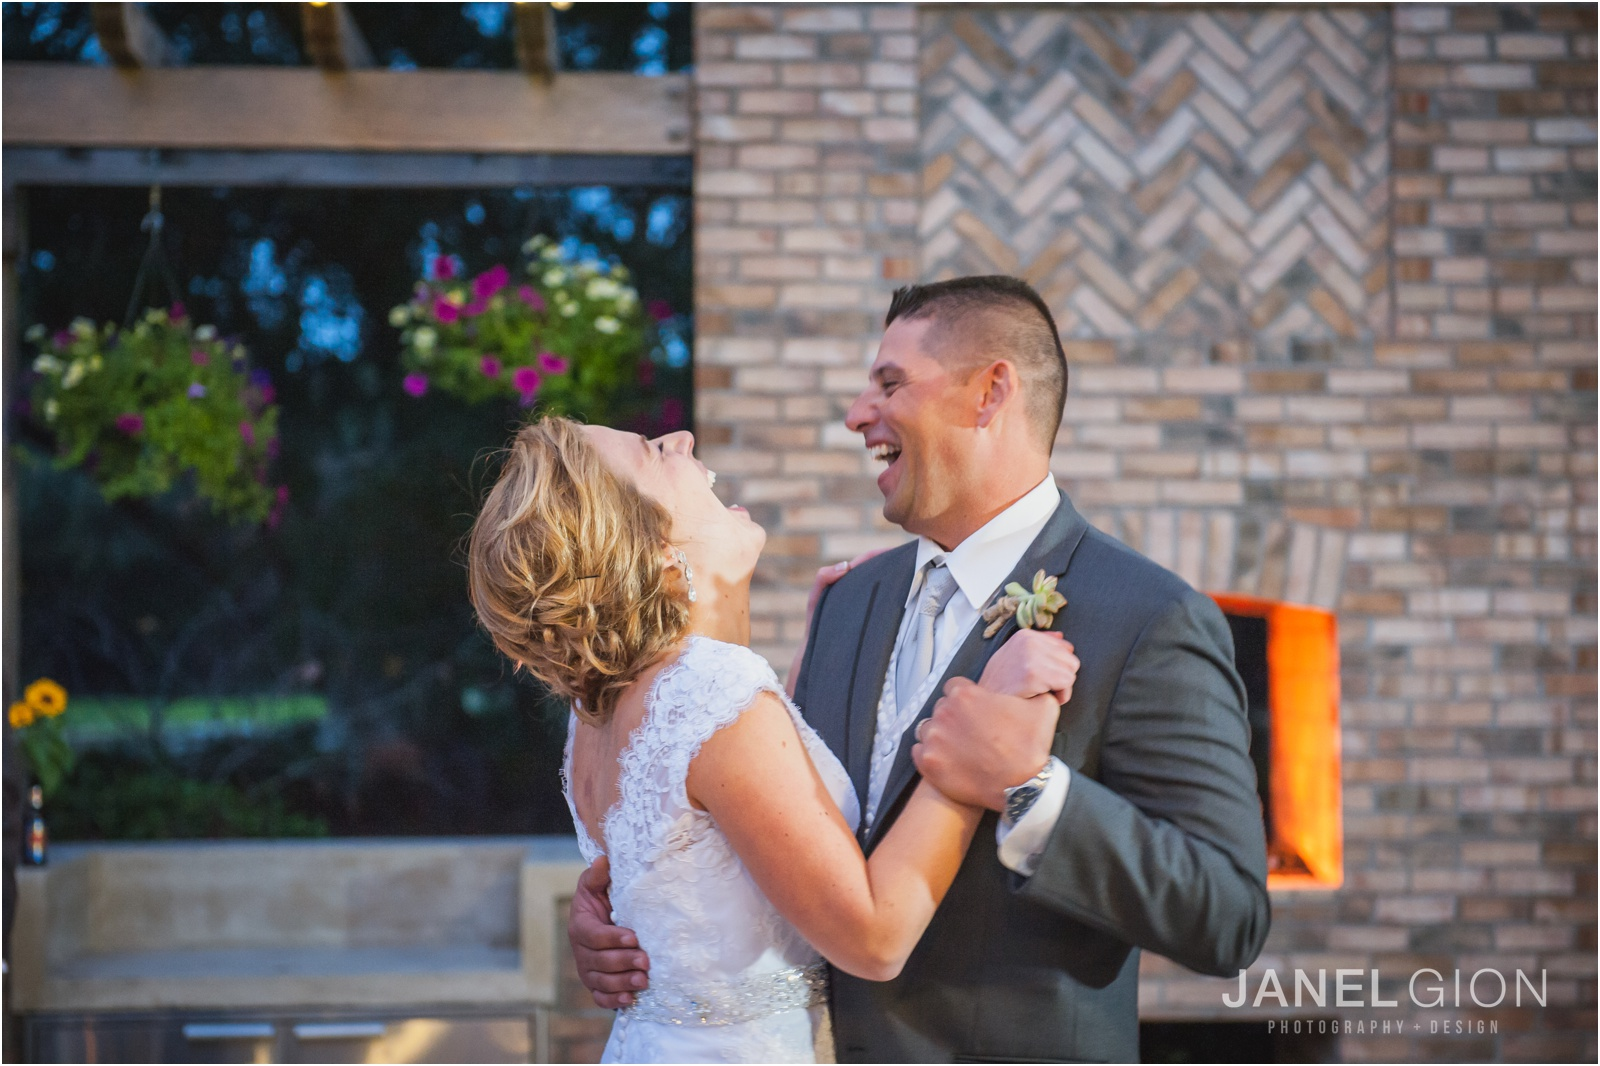 Destination Wedding Photographer Sandpoint Idaho Photography